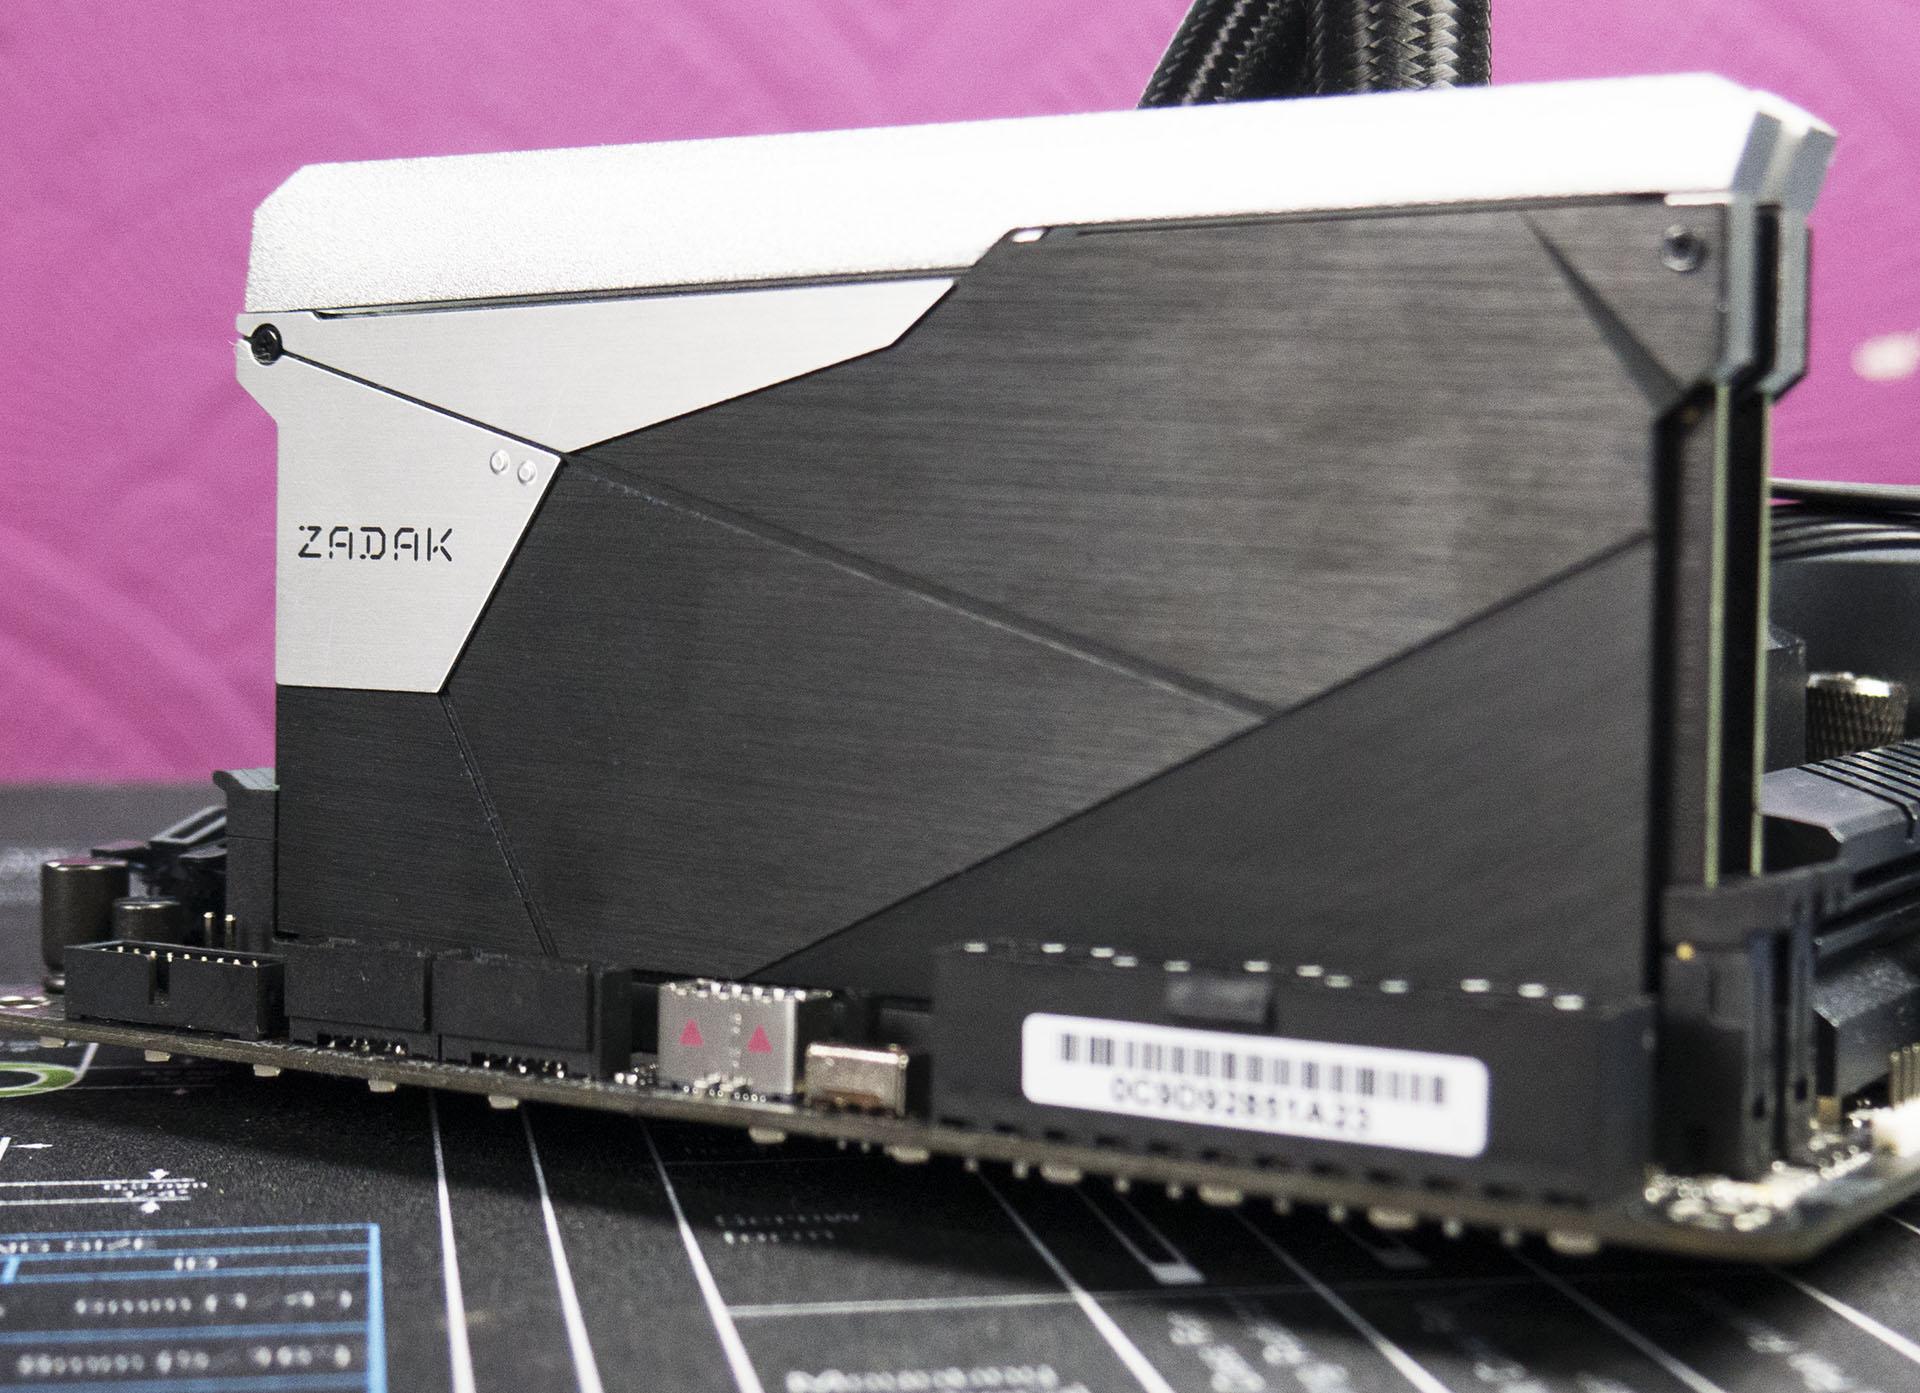 ZADAK Shield RGB DC Overview - Double Height DDR4: 32GB